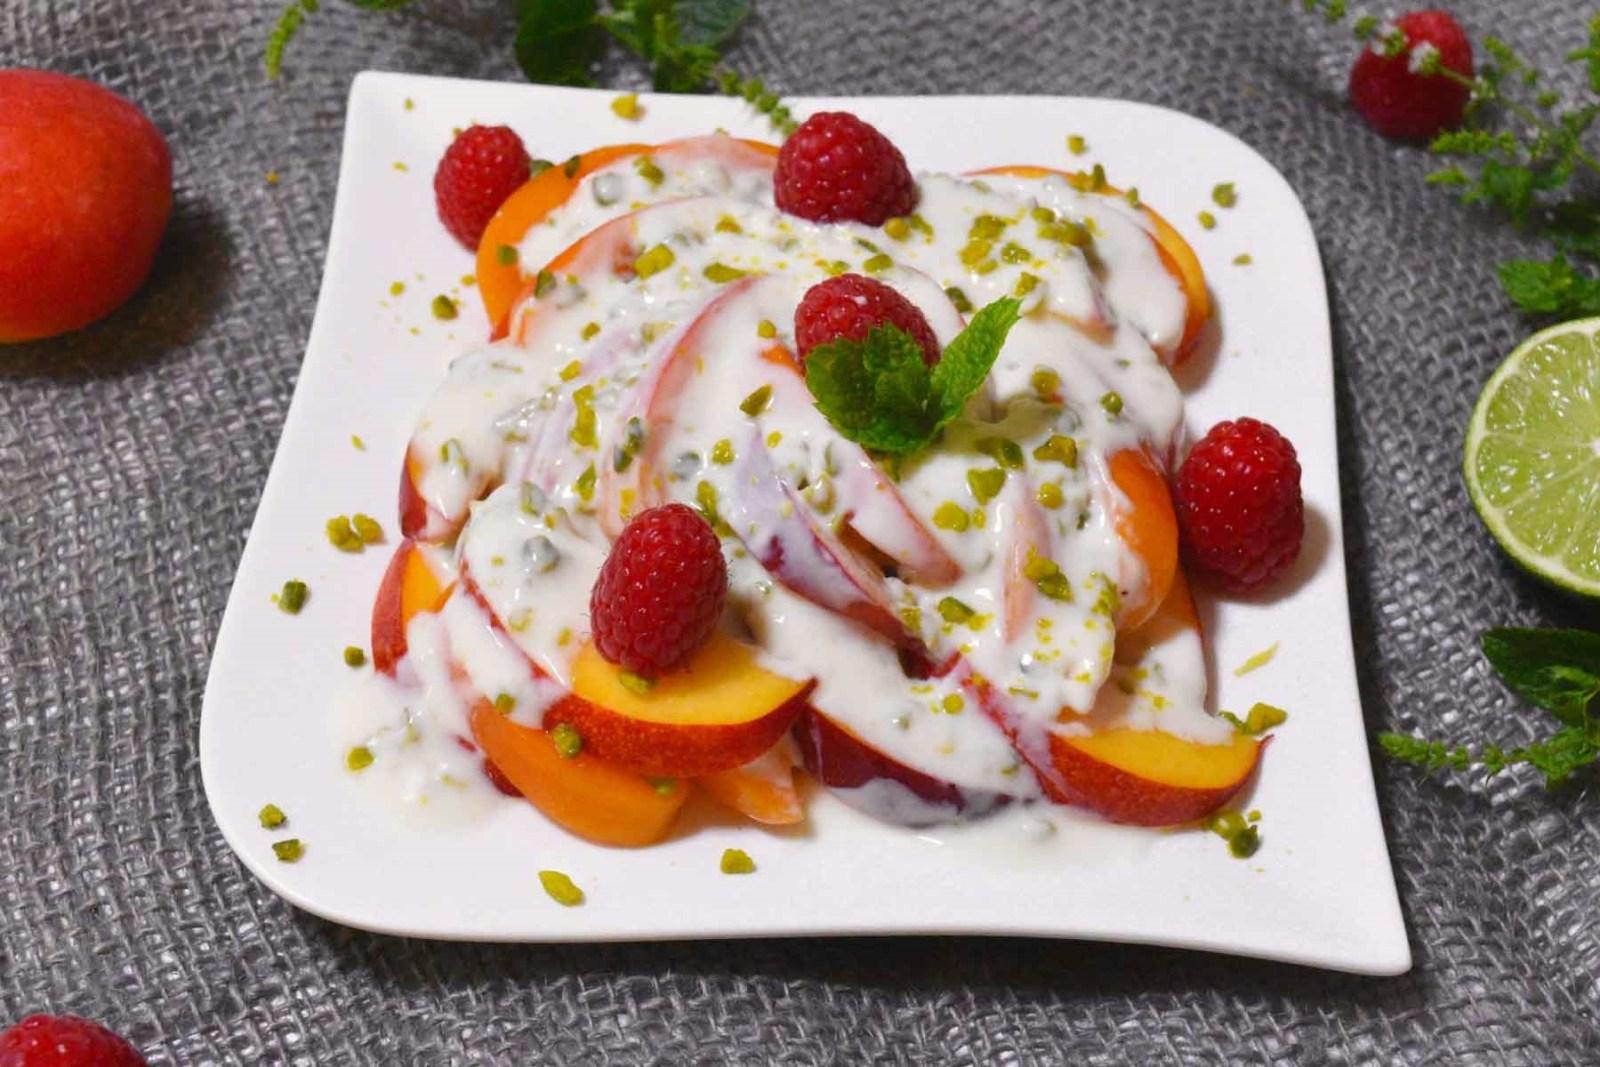 Aprikosen Nektarinen Salat mit Joghurtdressing-Rezept-ballesworld